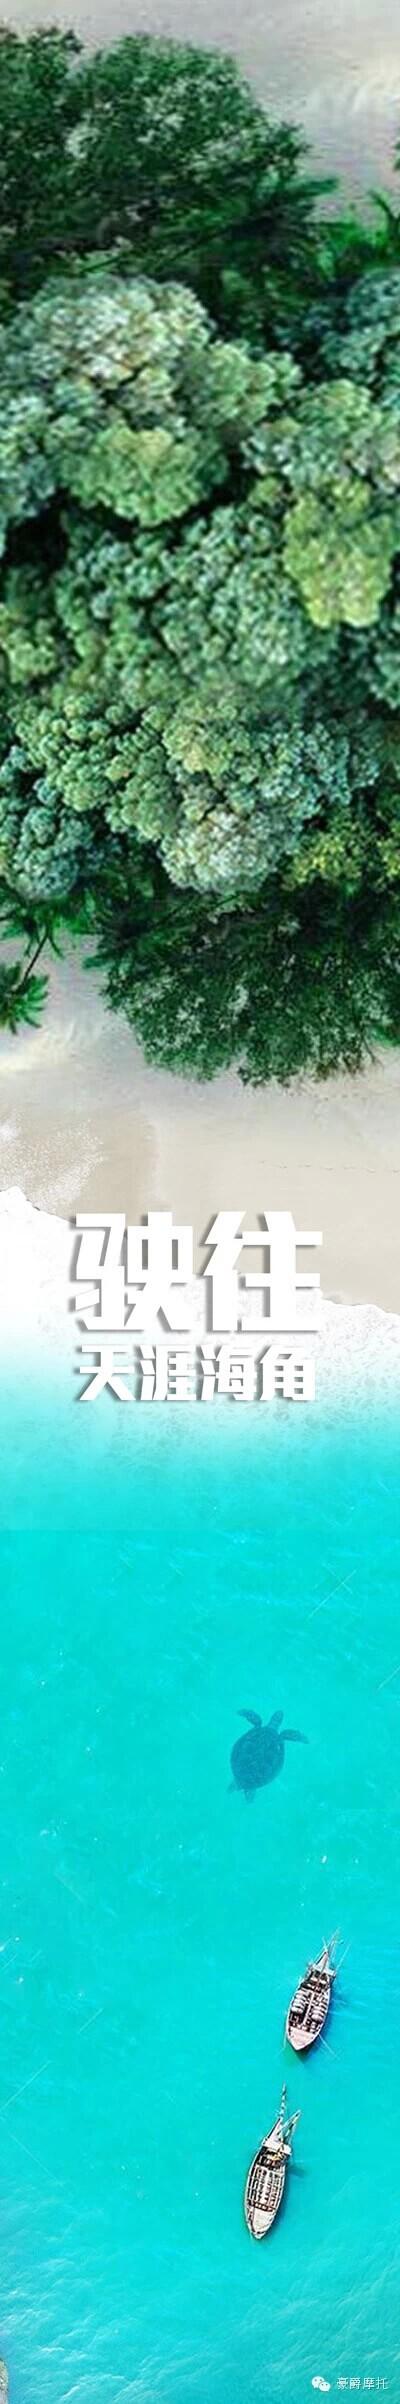 http://www.motoronline.cn/userfiles/image/20141103/0317592060b5d766539045.jpg